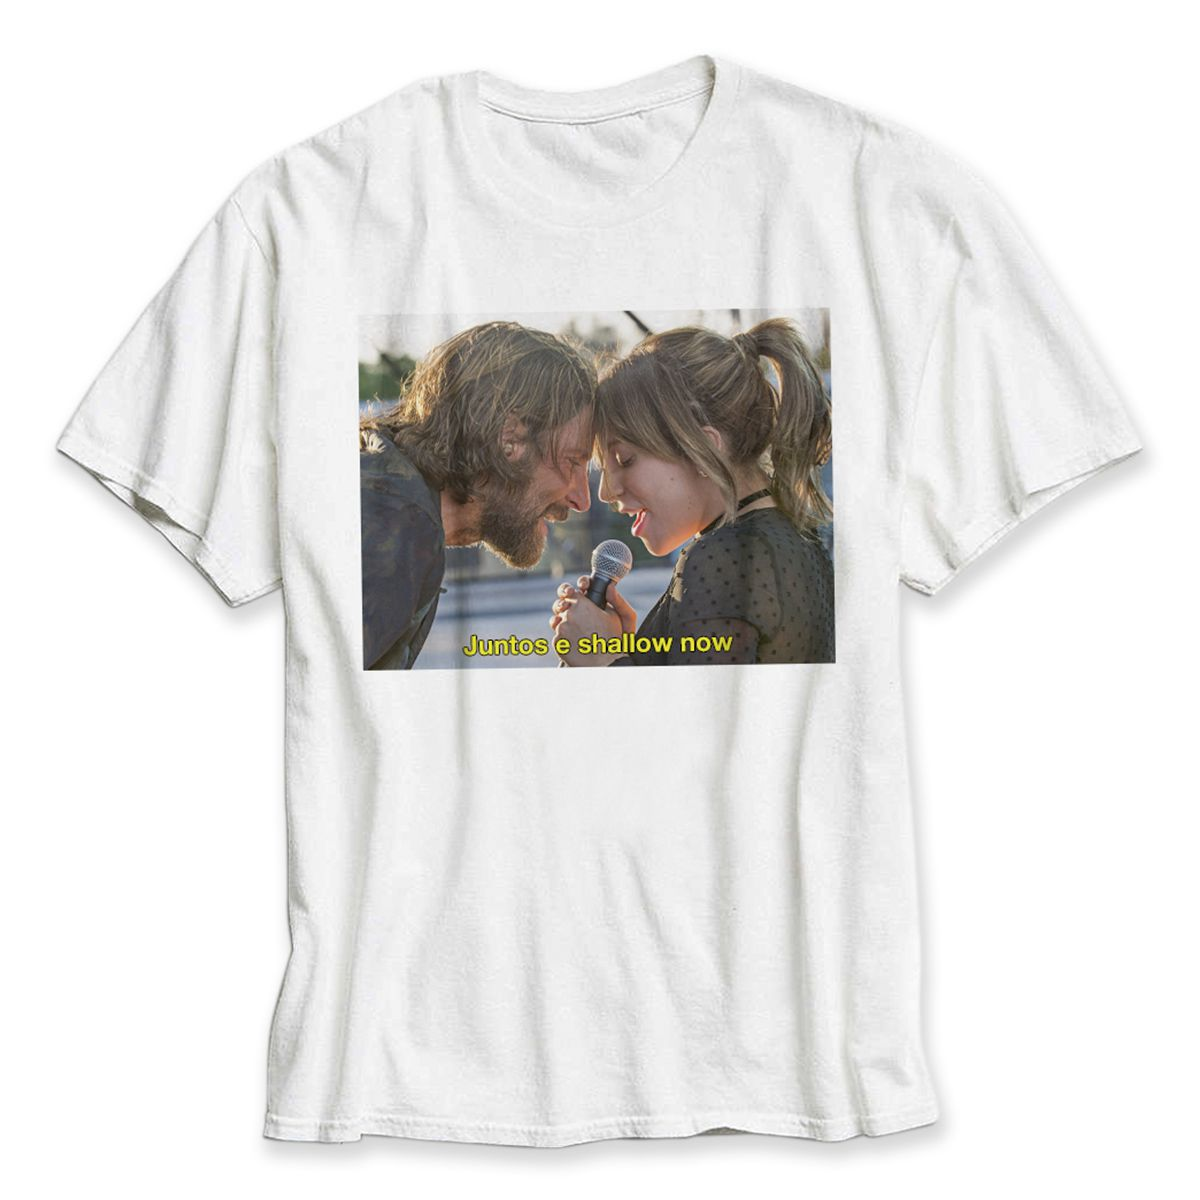 Camiseta Masculina Juntos e Shallow Now